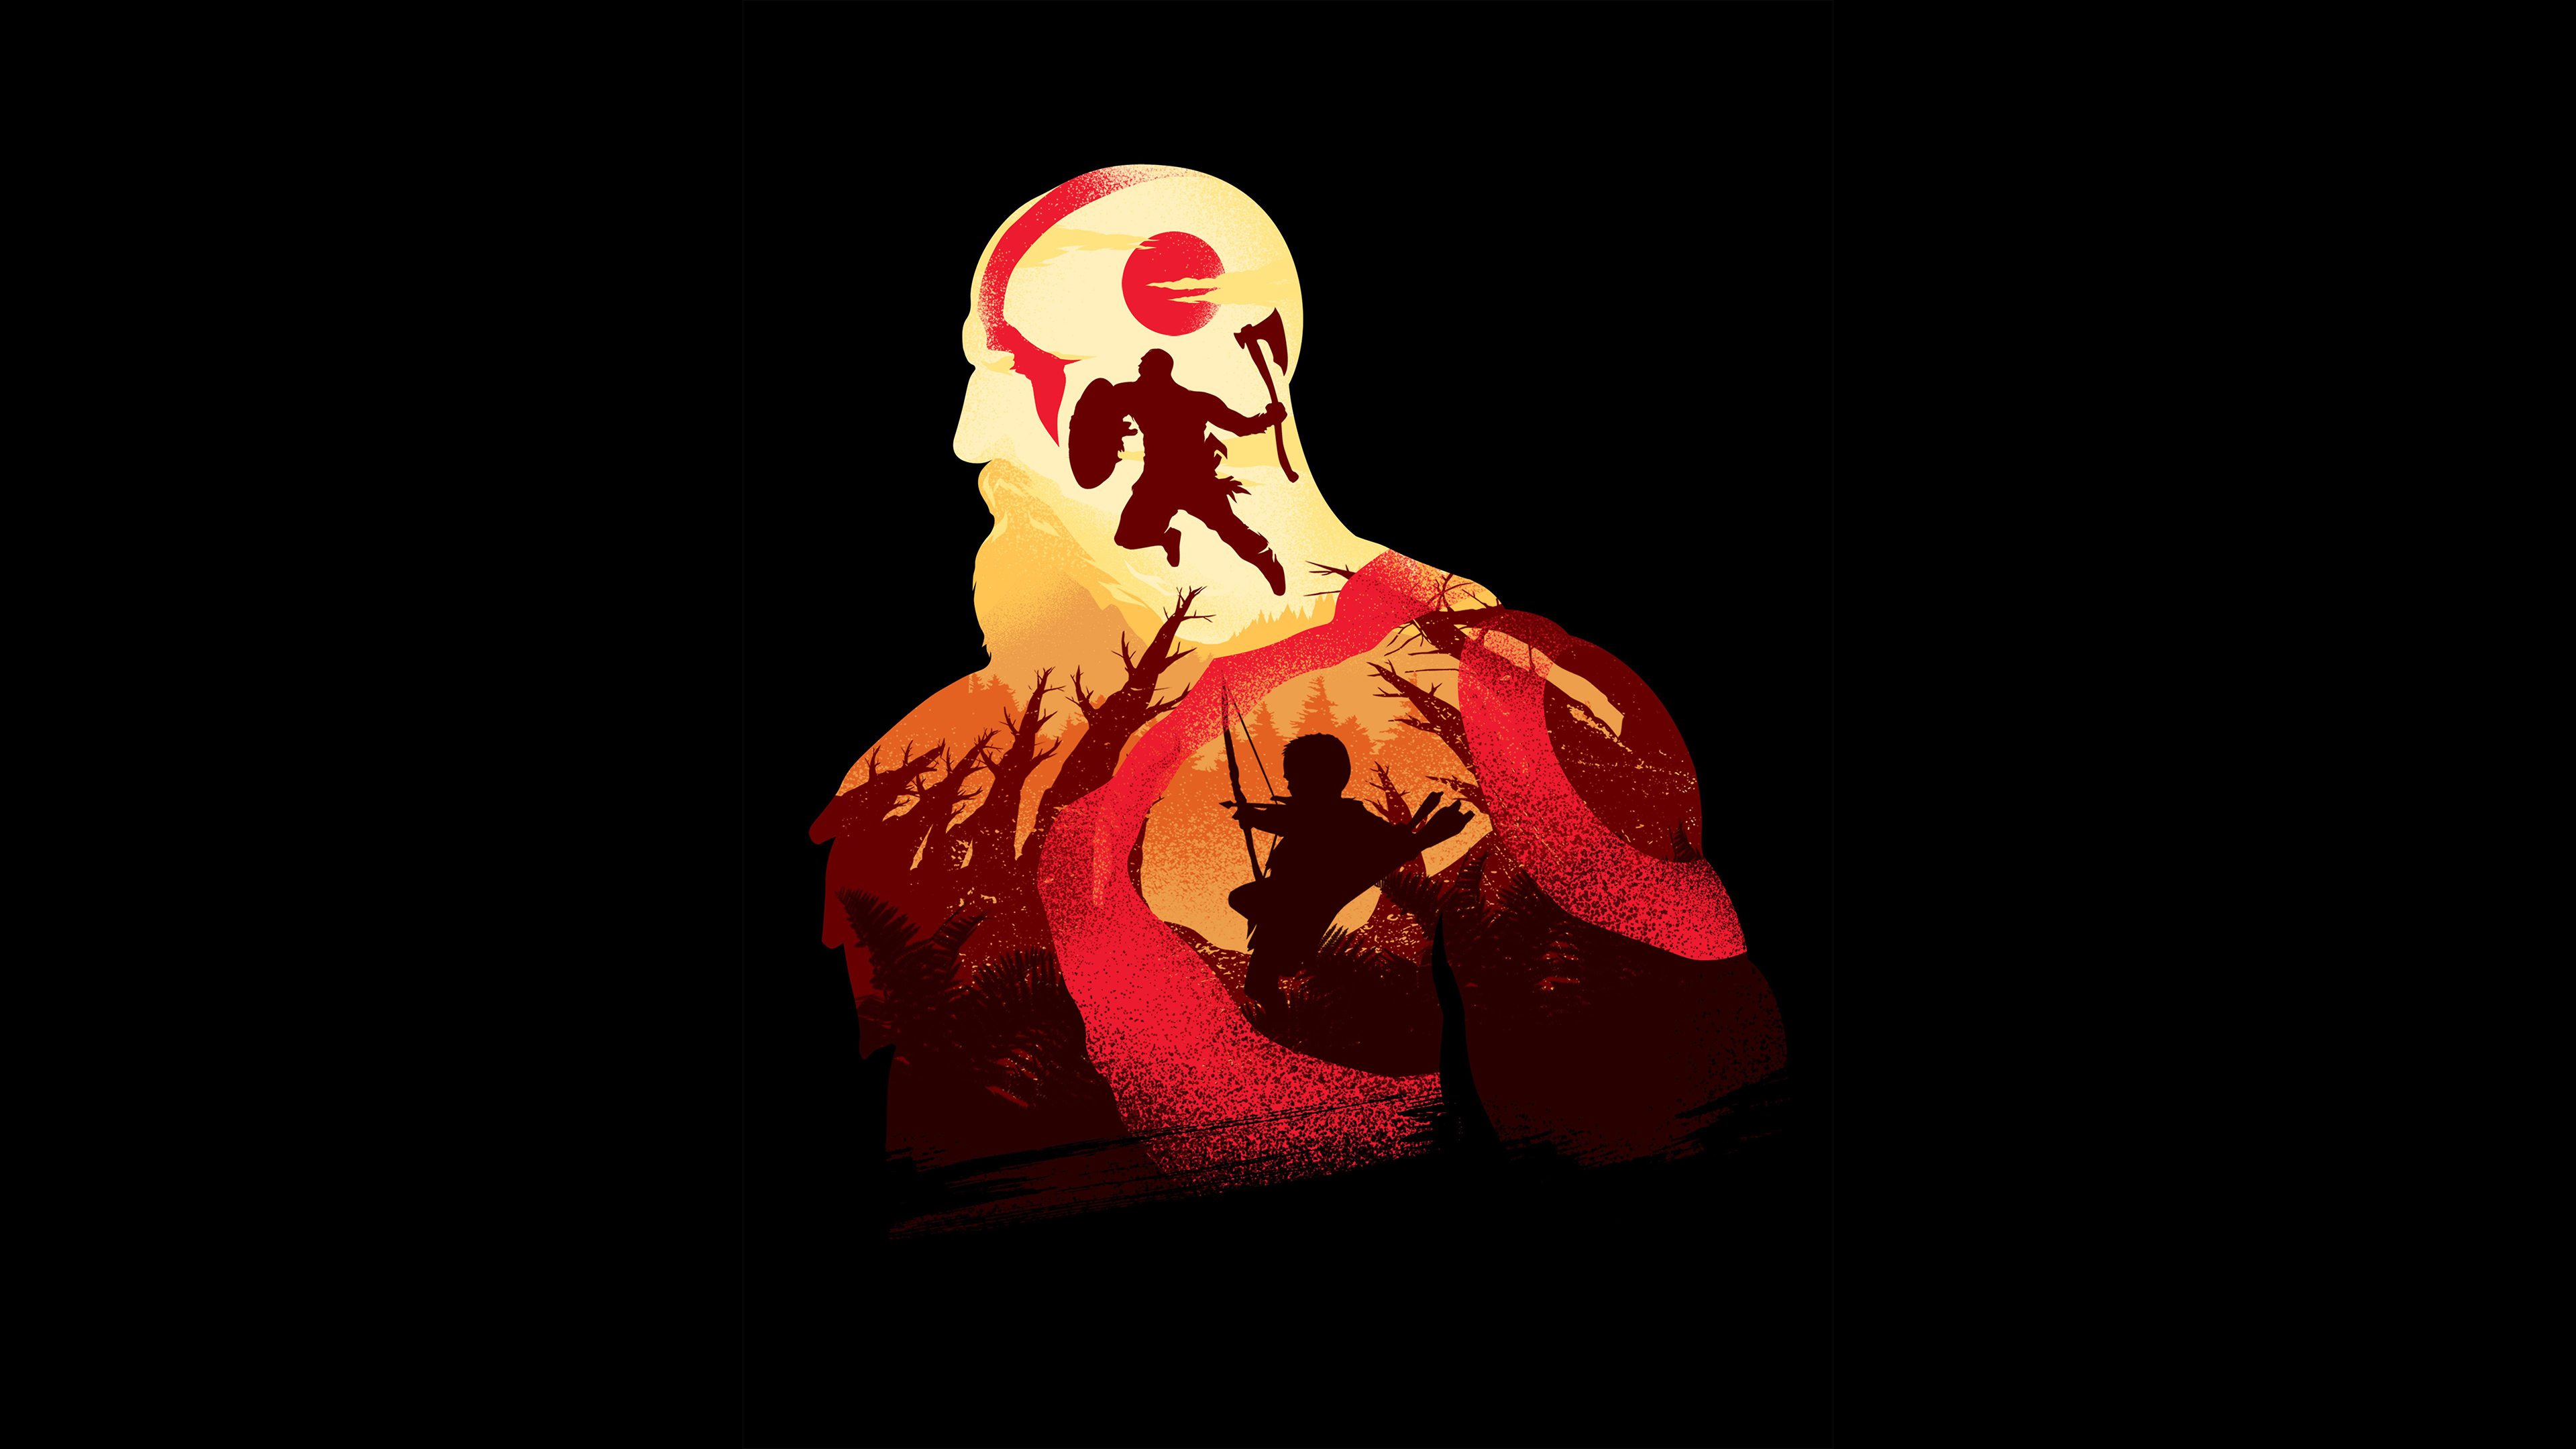 Kratos In God Of War 4K Minimalism, HD Games, 4k ...